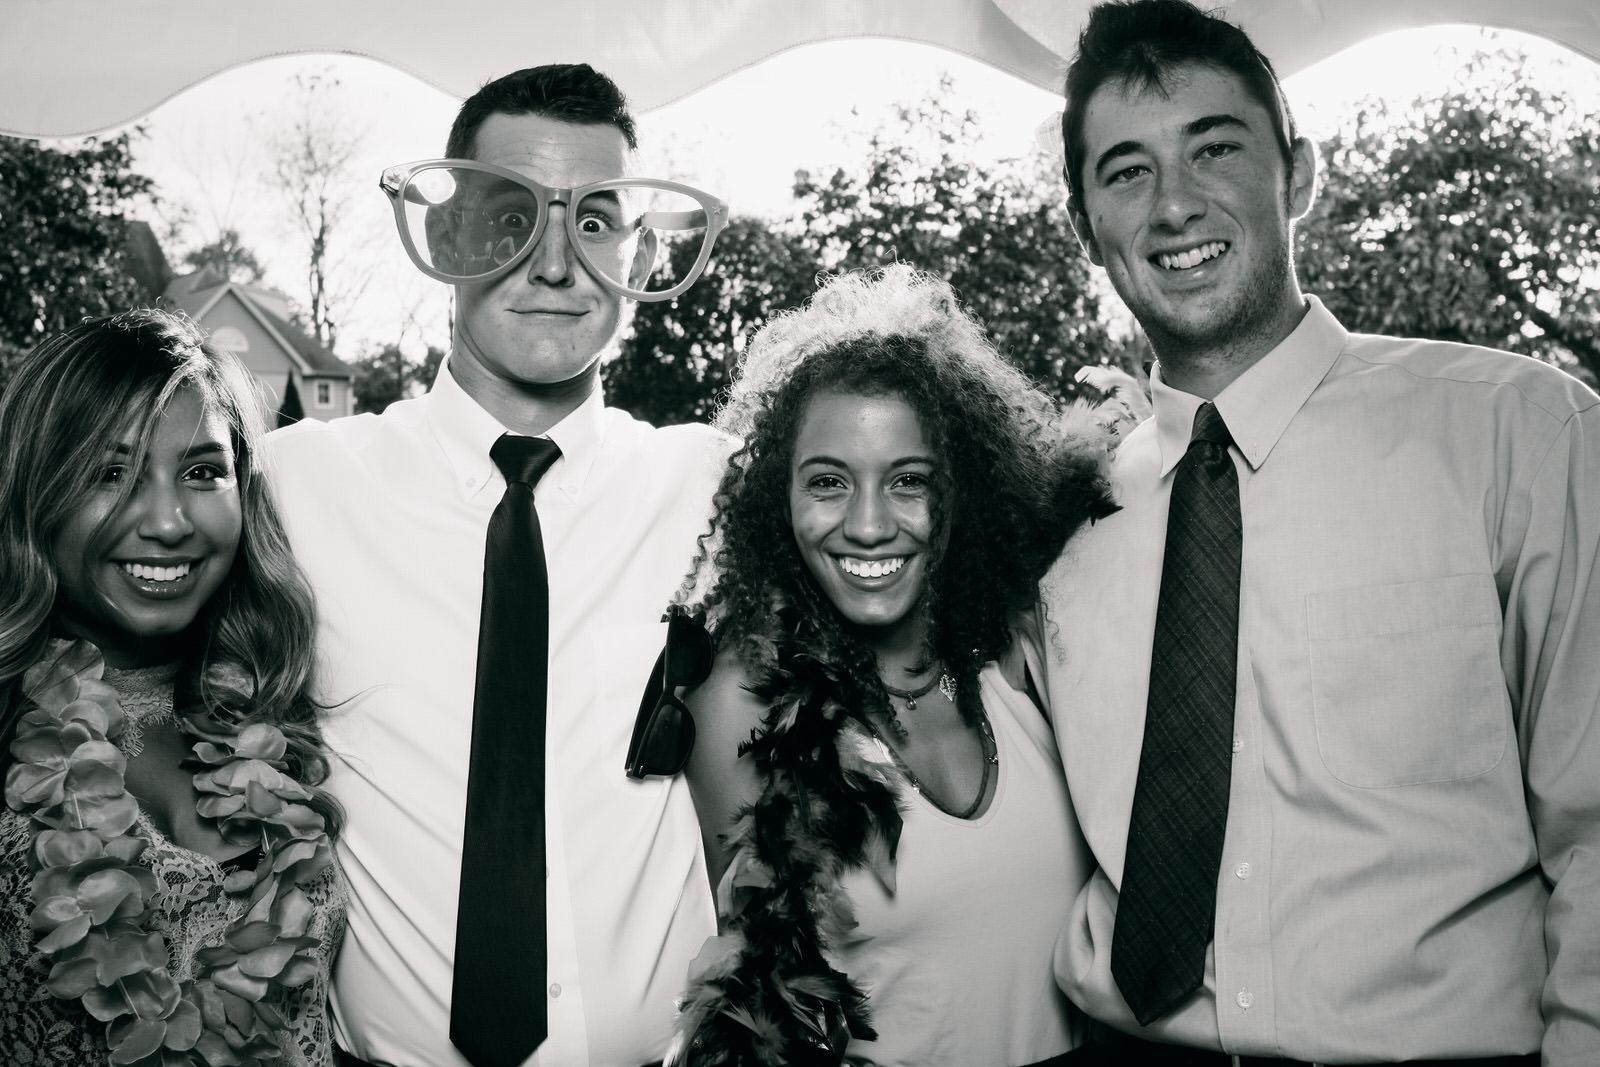 Kate-Andrew-Wedding-Photo-Booth-6.jpg